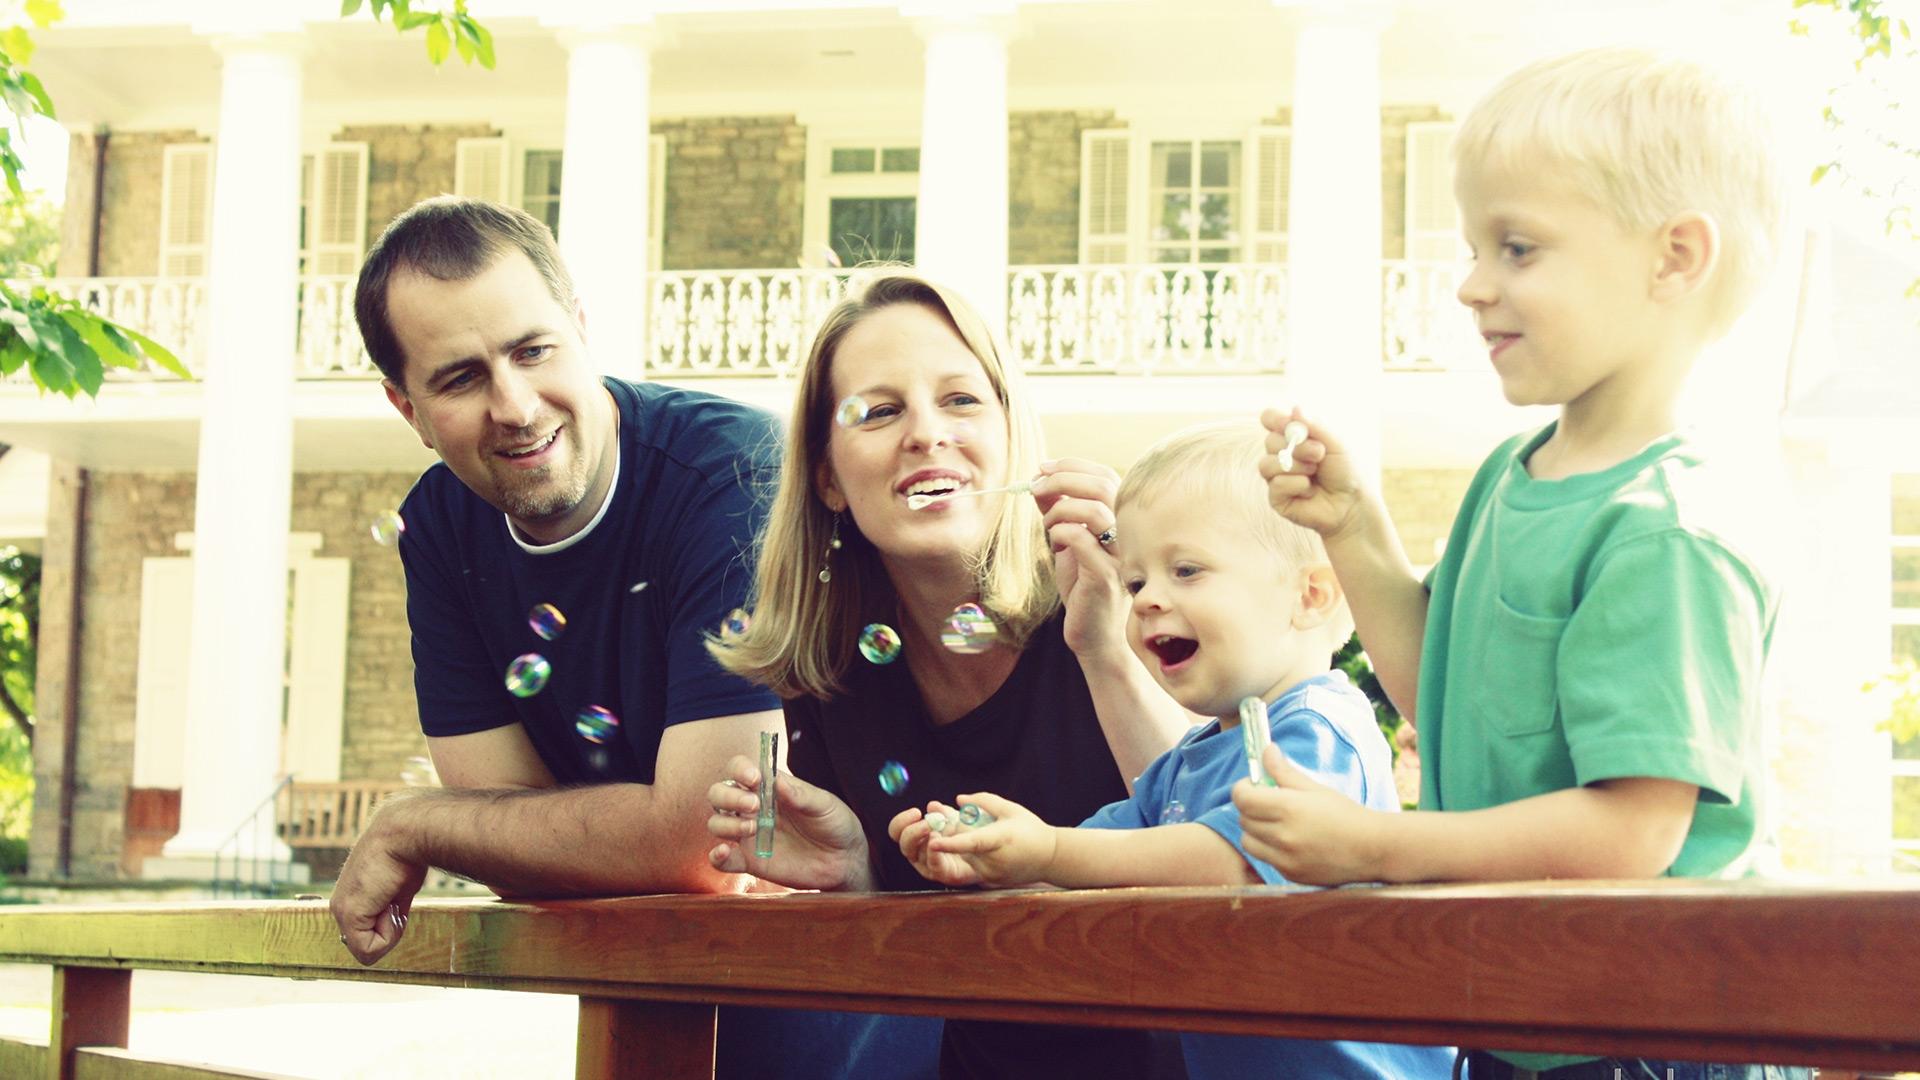 Family photos - bubbles | Sheknows.com